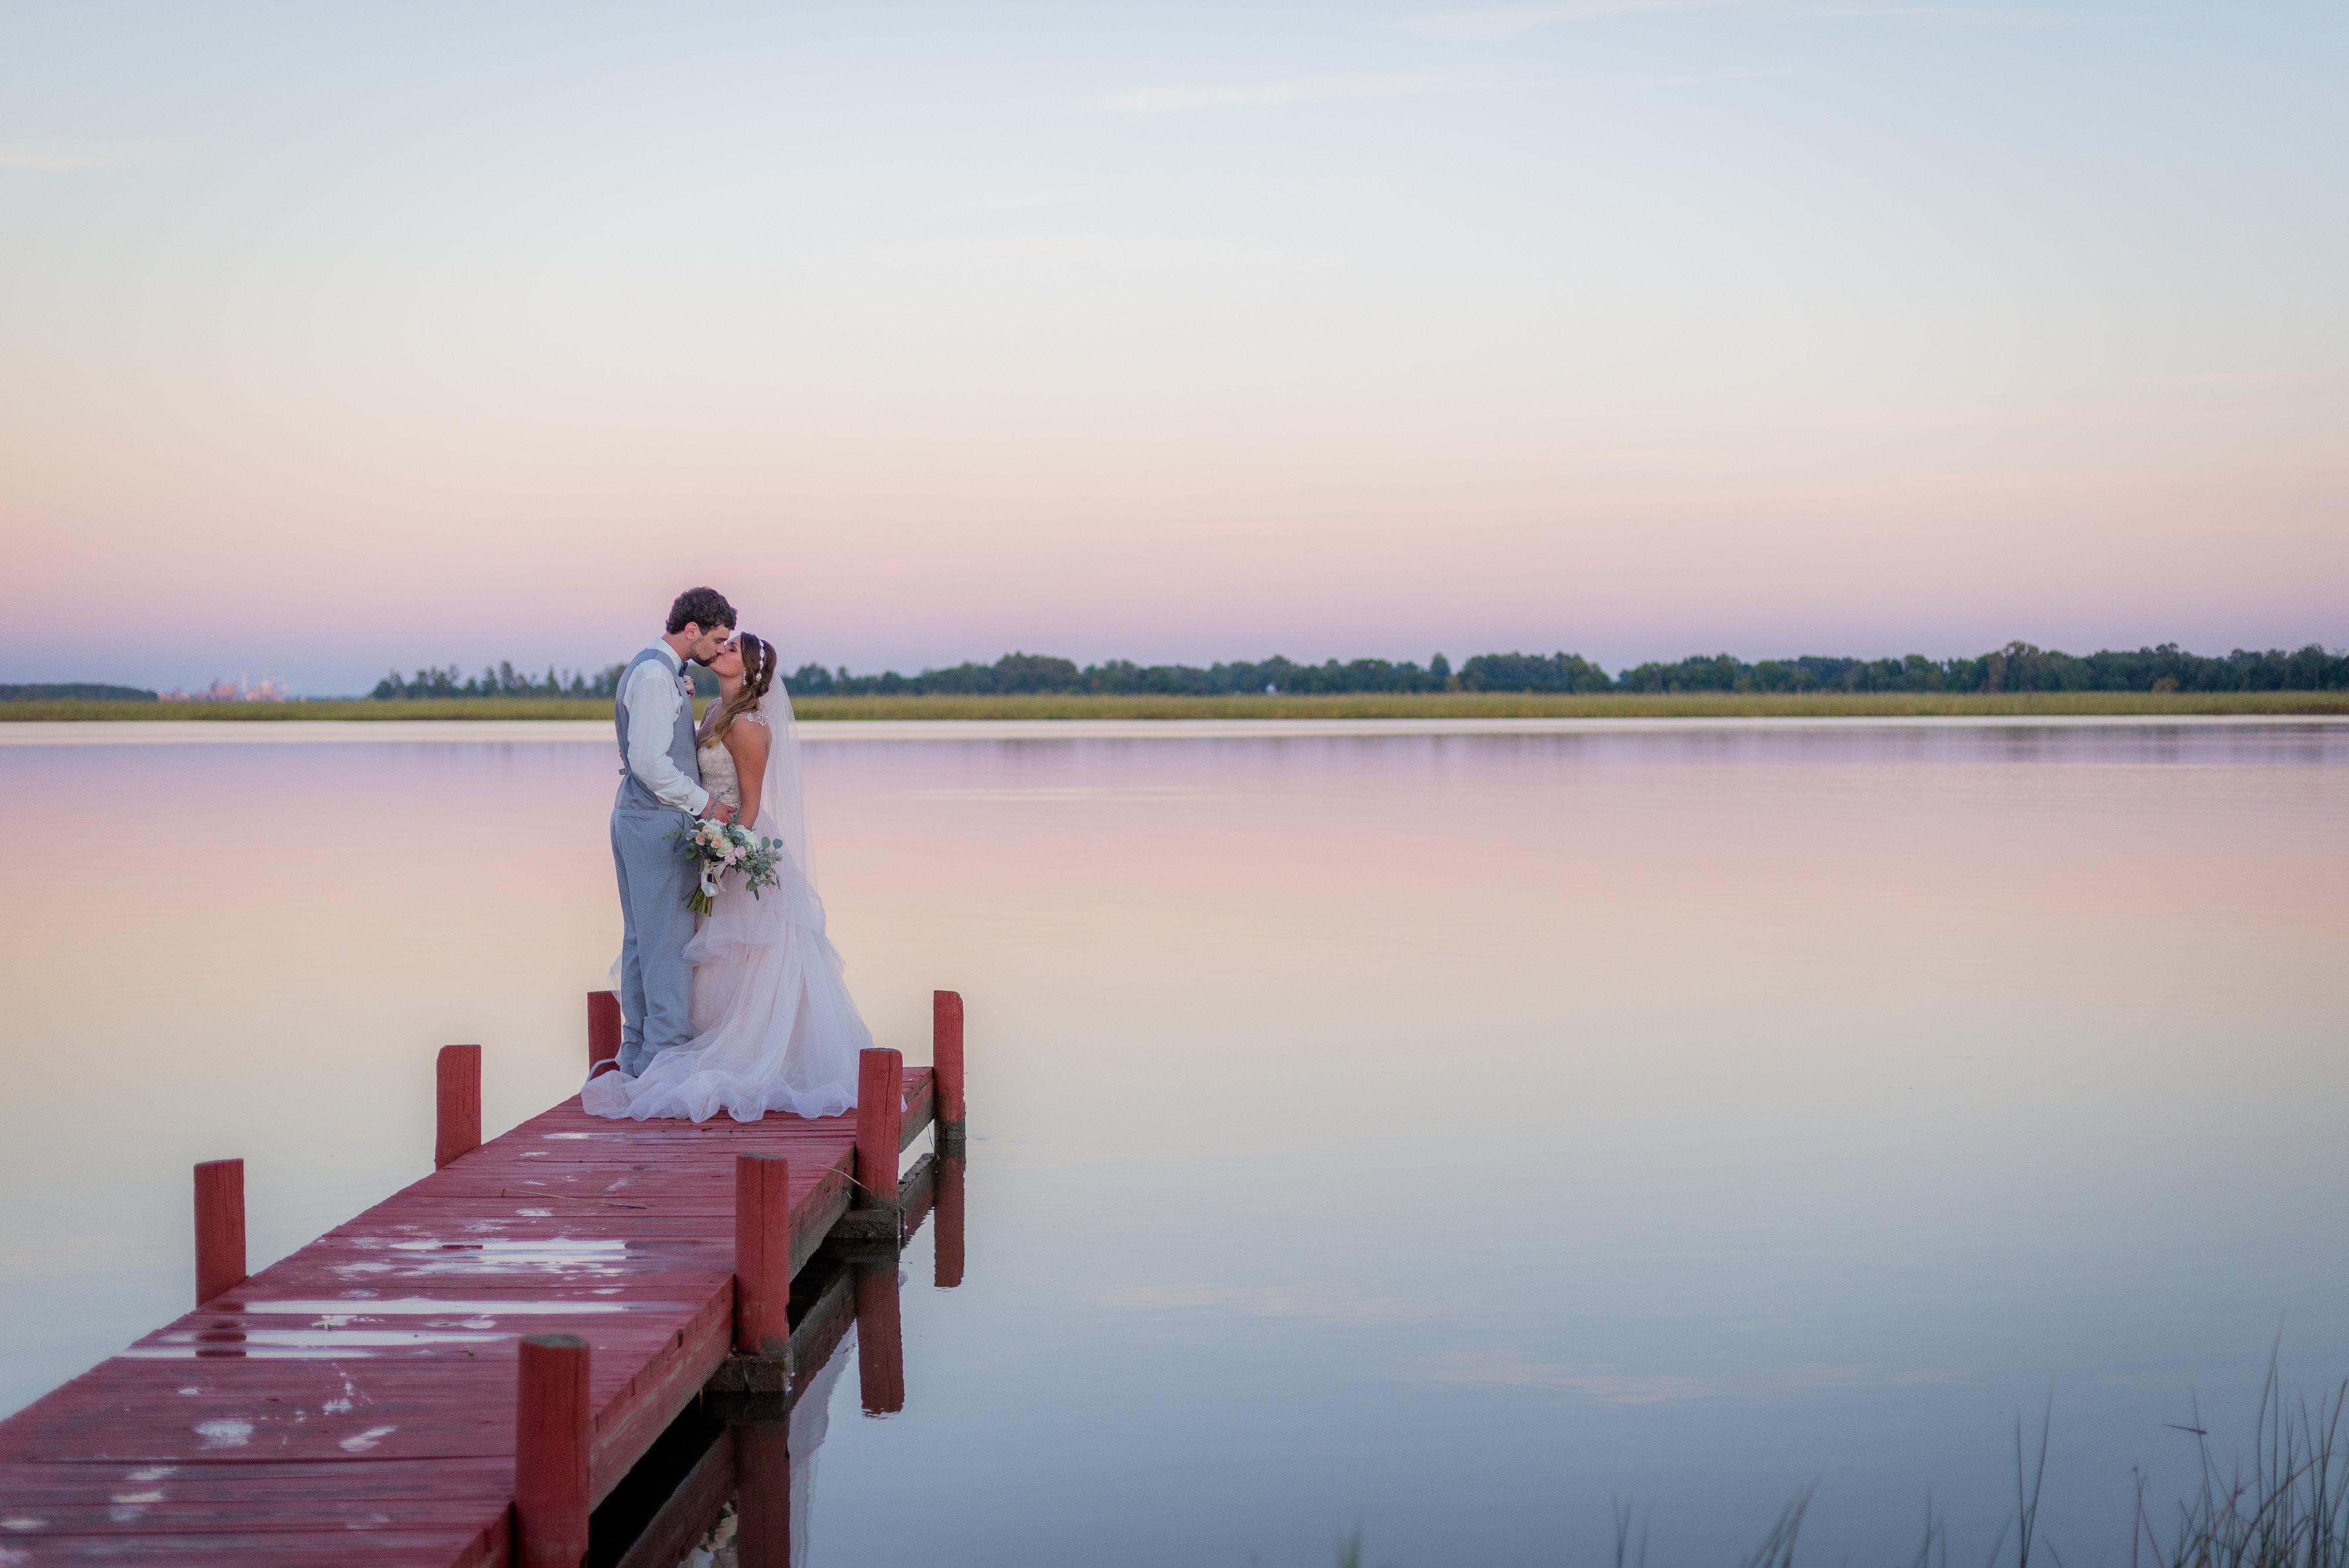 Amber L Richards Photography 6 Ashley Aaron Ruggerio s Wedding-Ashley Aaron s Portraits-0053